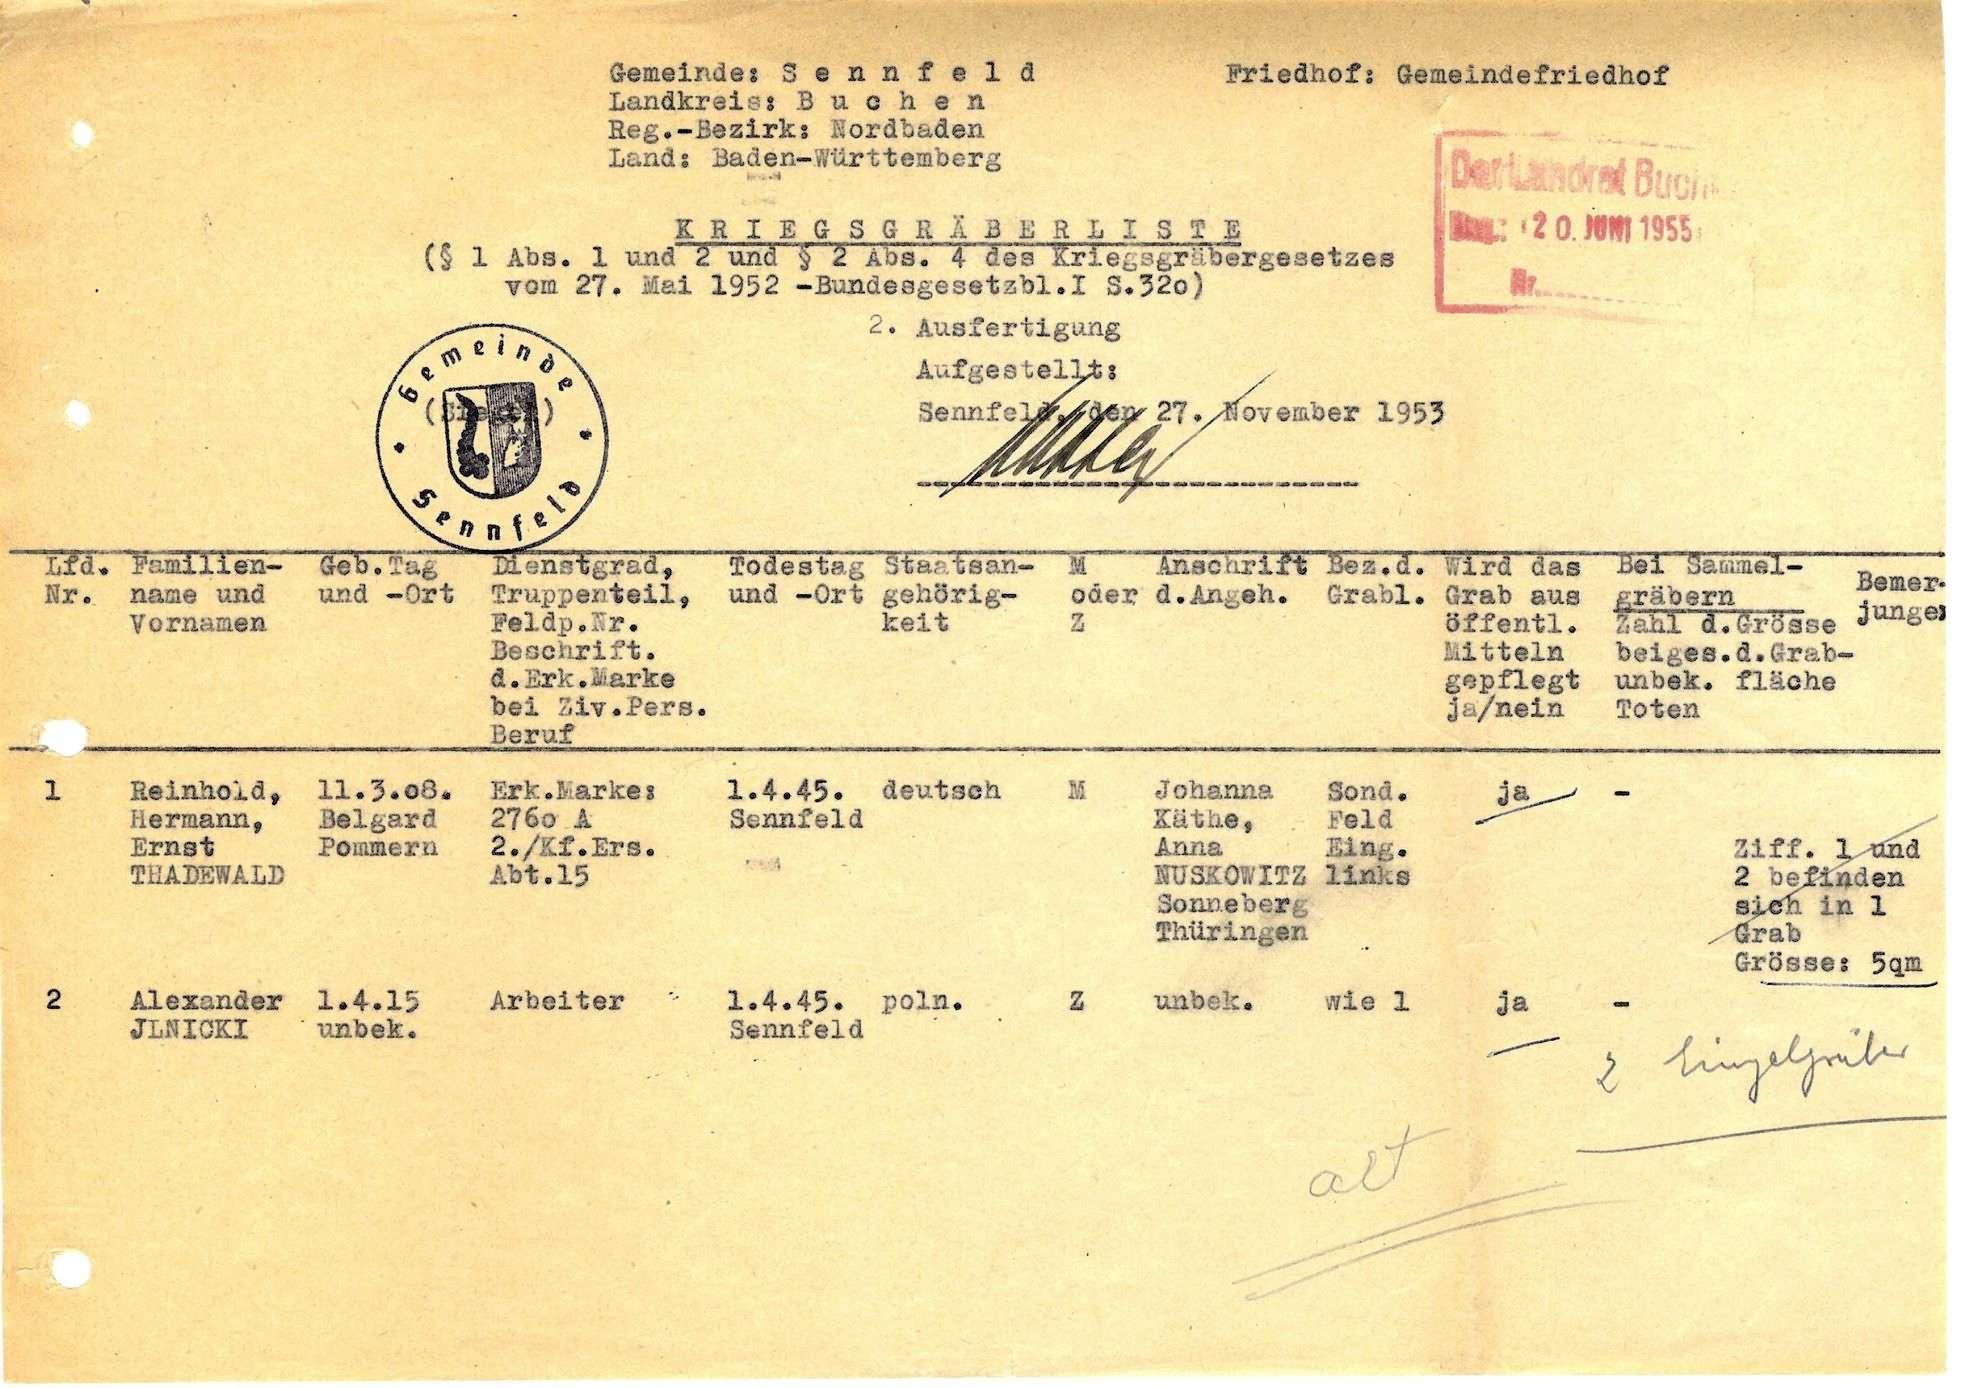 Sennfeld, Bild 3